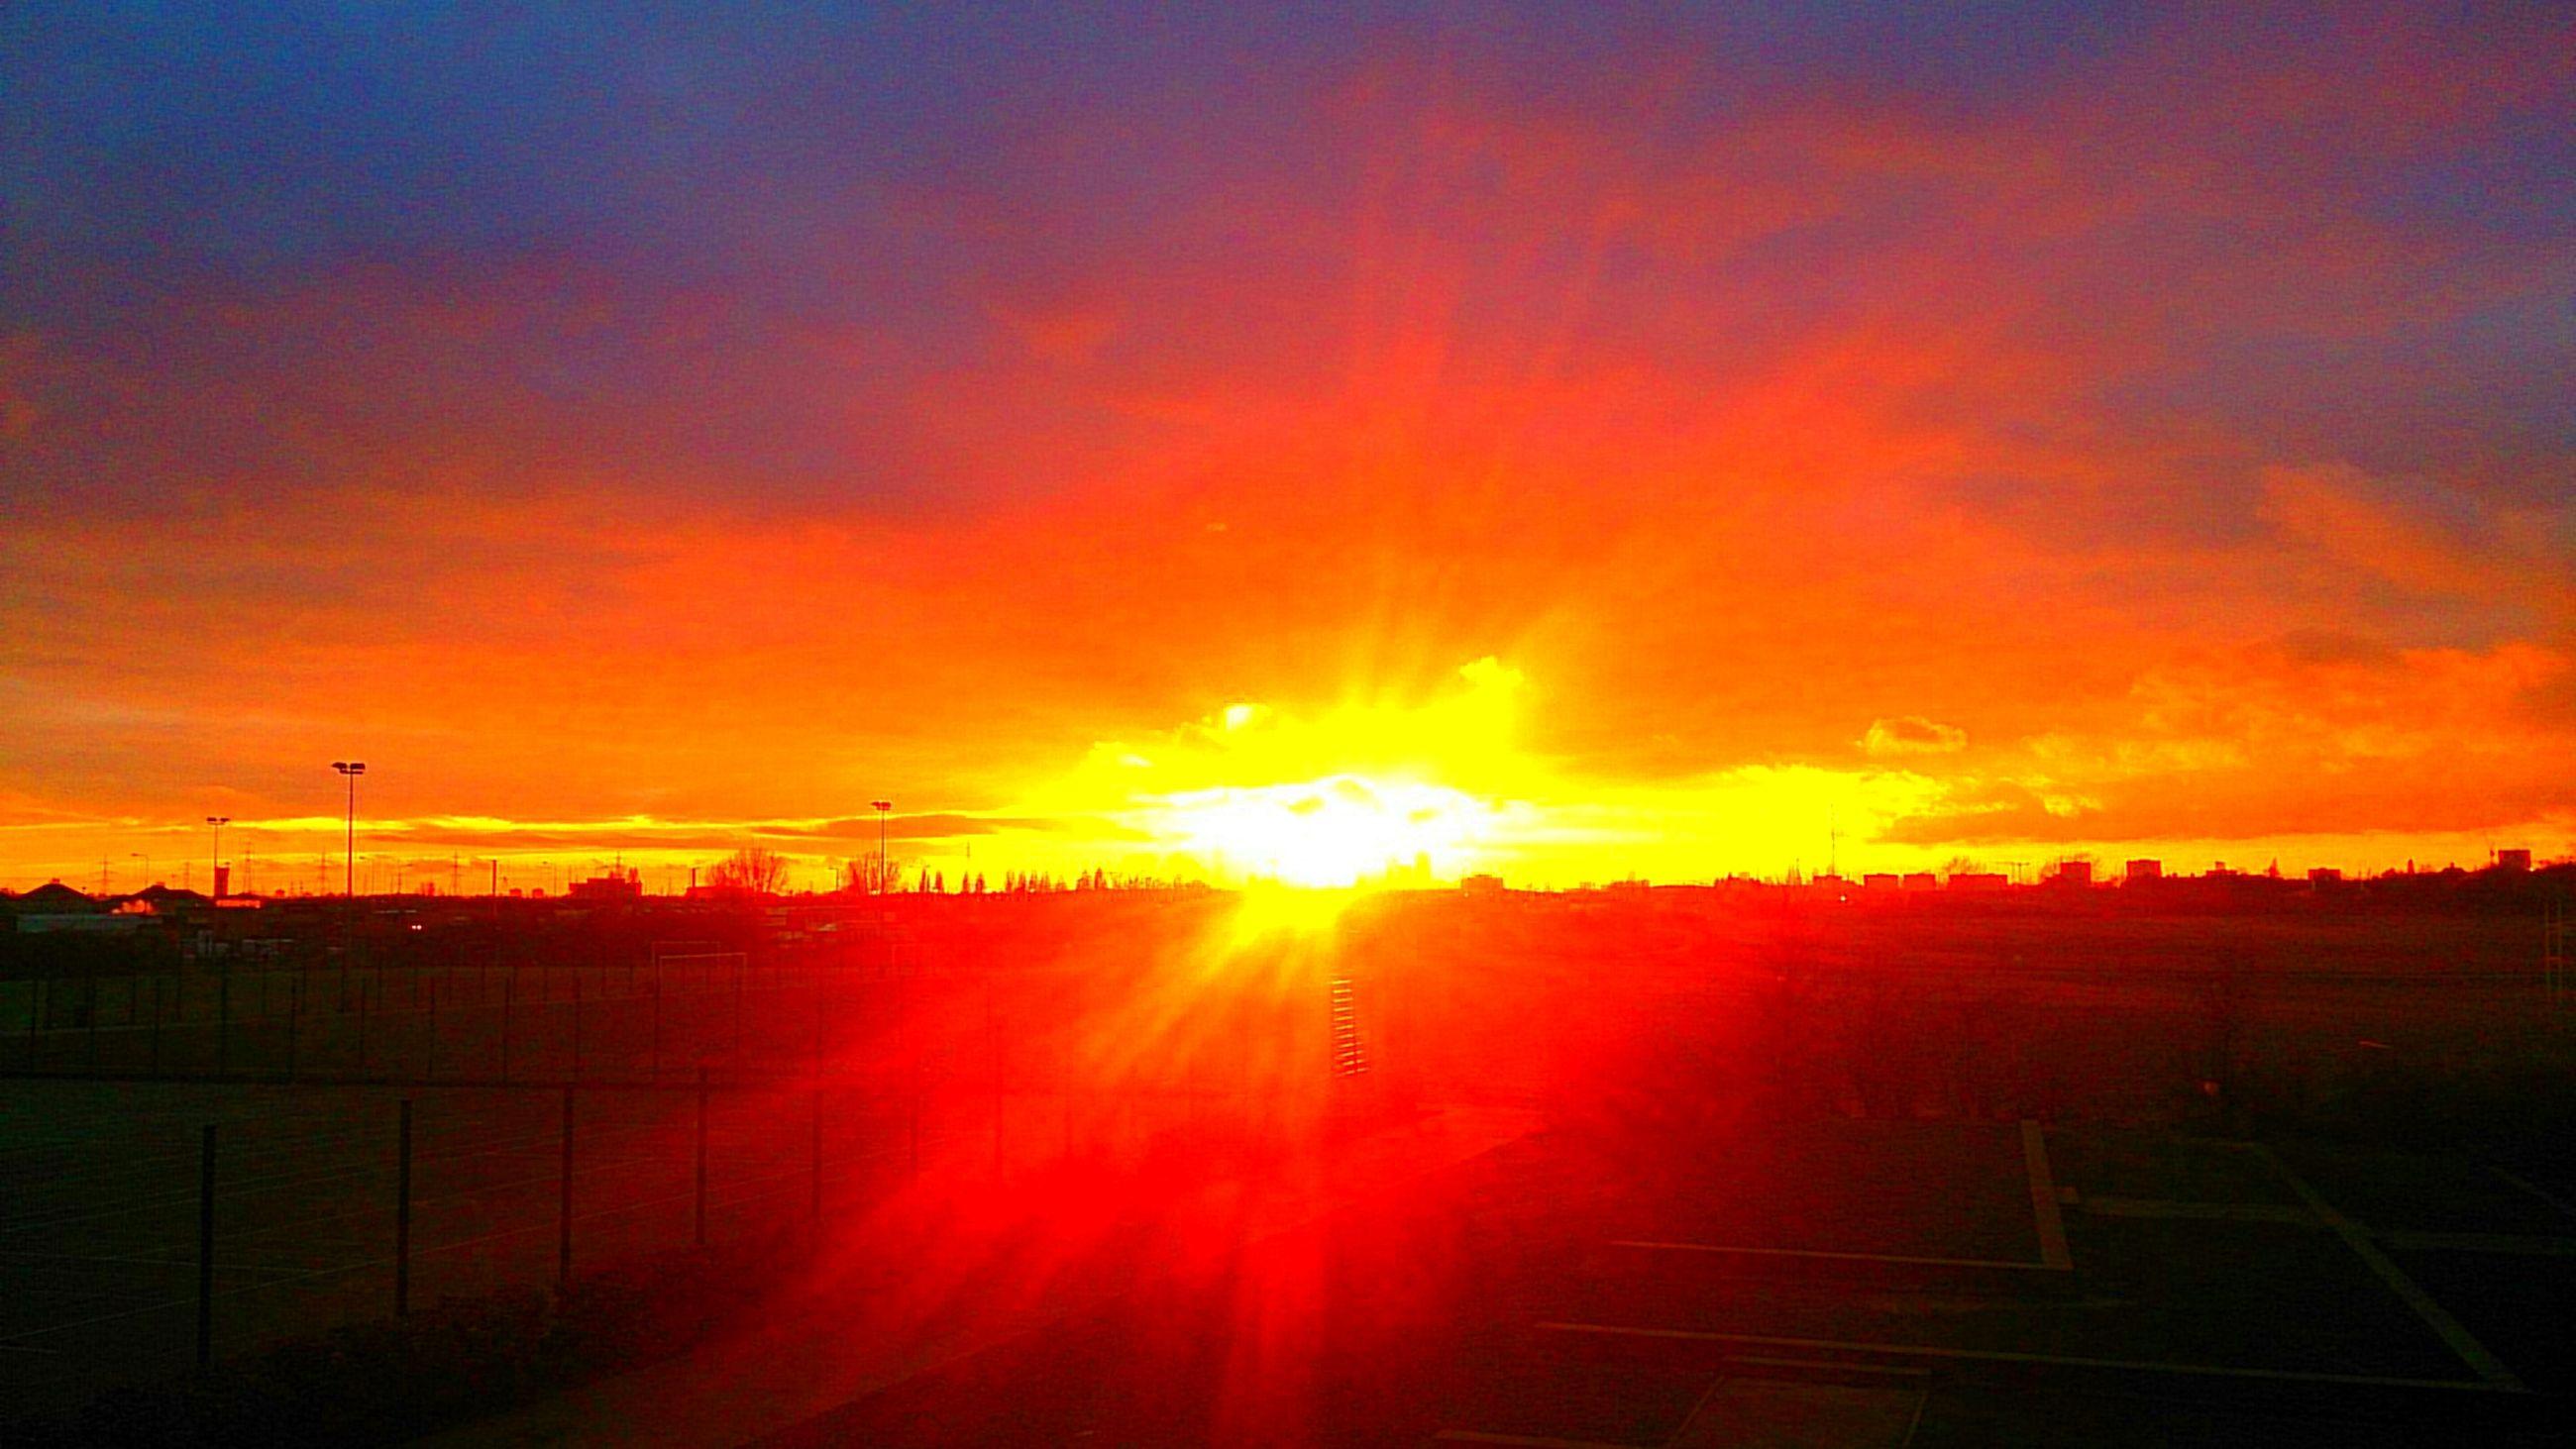 sunset, sun, orange color, sky, silhouette, beauty in nature, scenics, sunlight, tranquil scene, sunbeam, tranquility, idyllic, nature, cloud - sky, lens flare, landscape, field, dramatic sky, outdoors, back lit